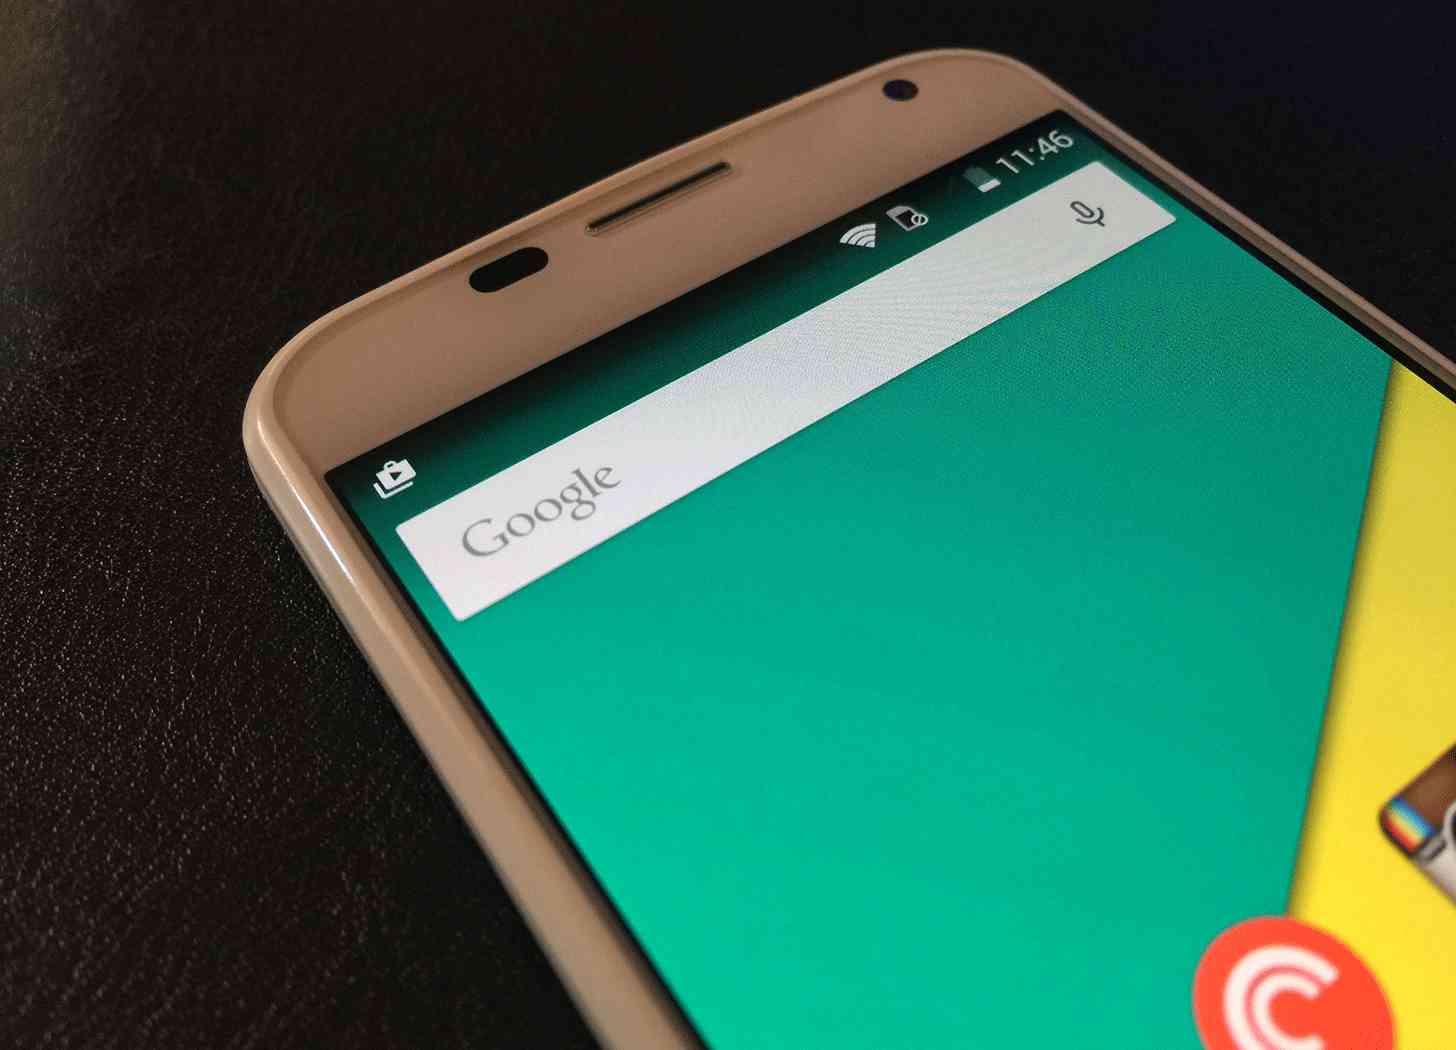 Google Search Moto X large